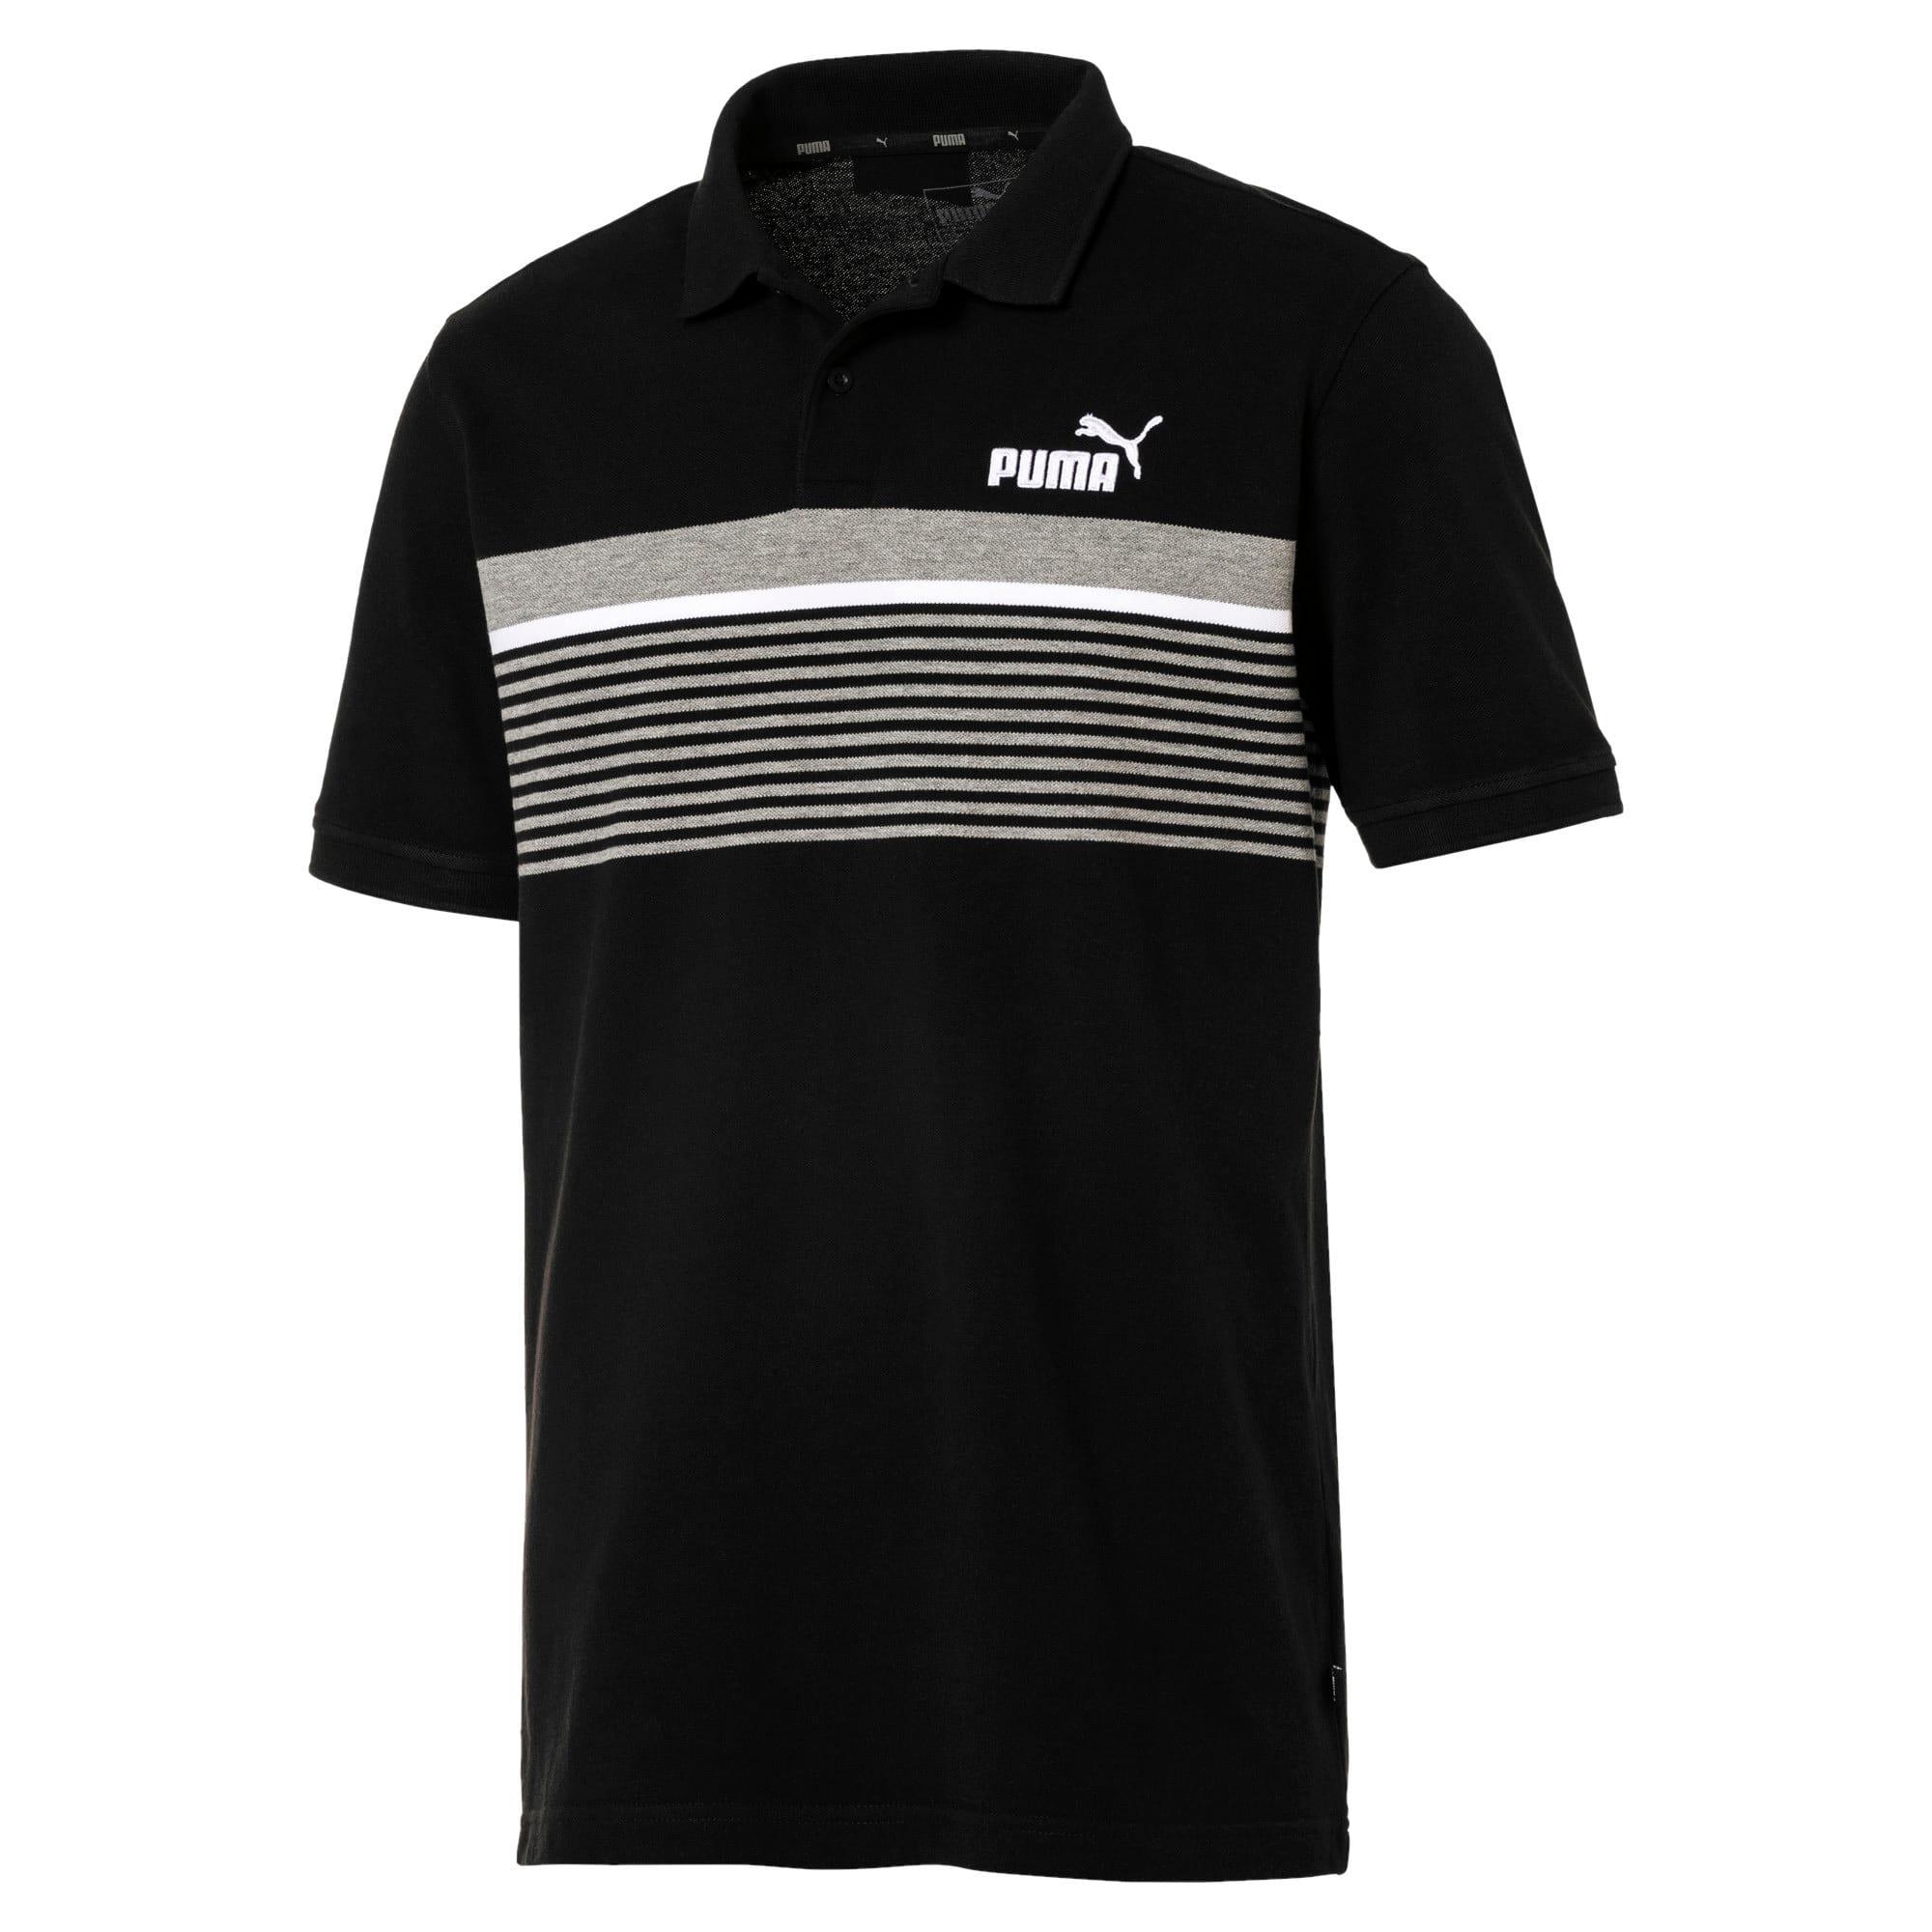 Miniatura 1 de Camiseta tipo polo ESS+ Striped para hombre, Cotton Black, mediano